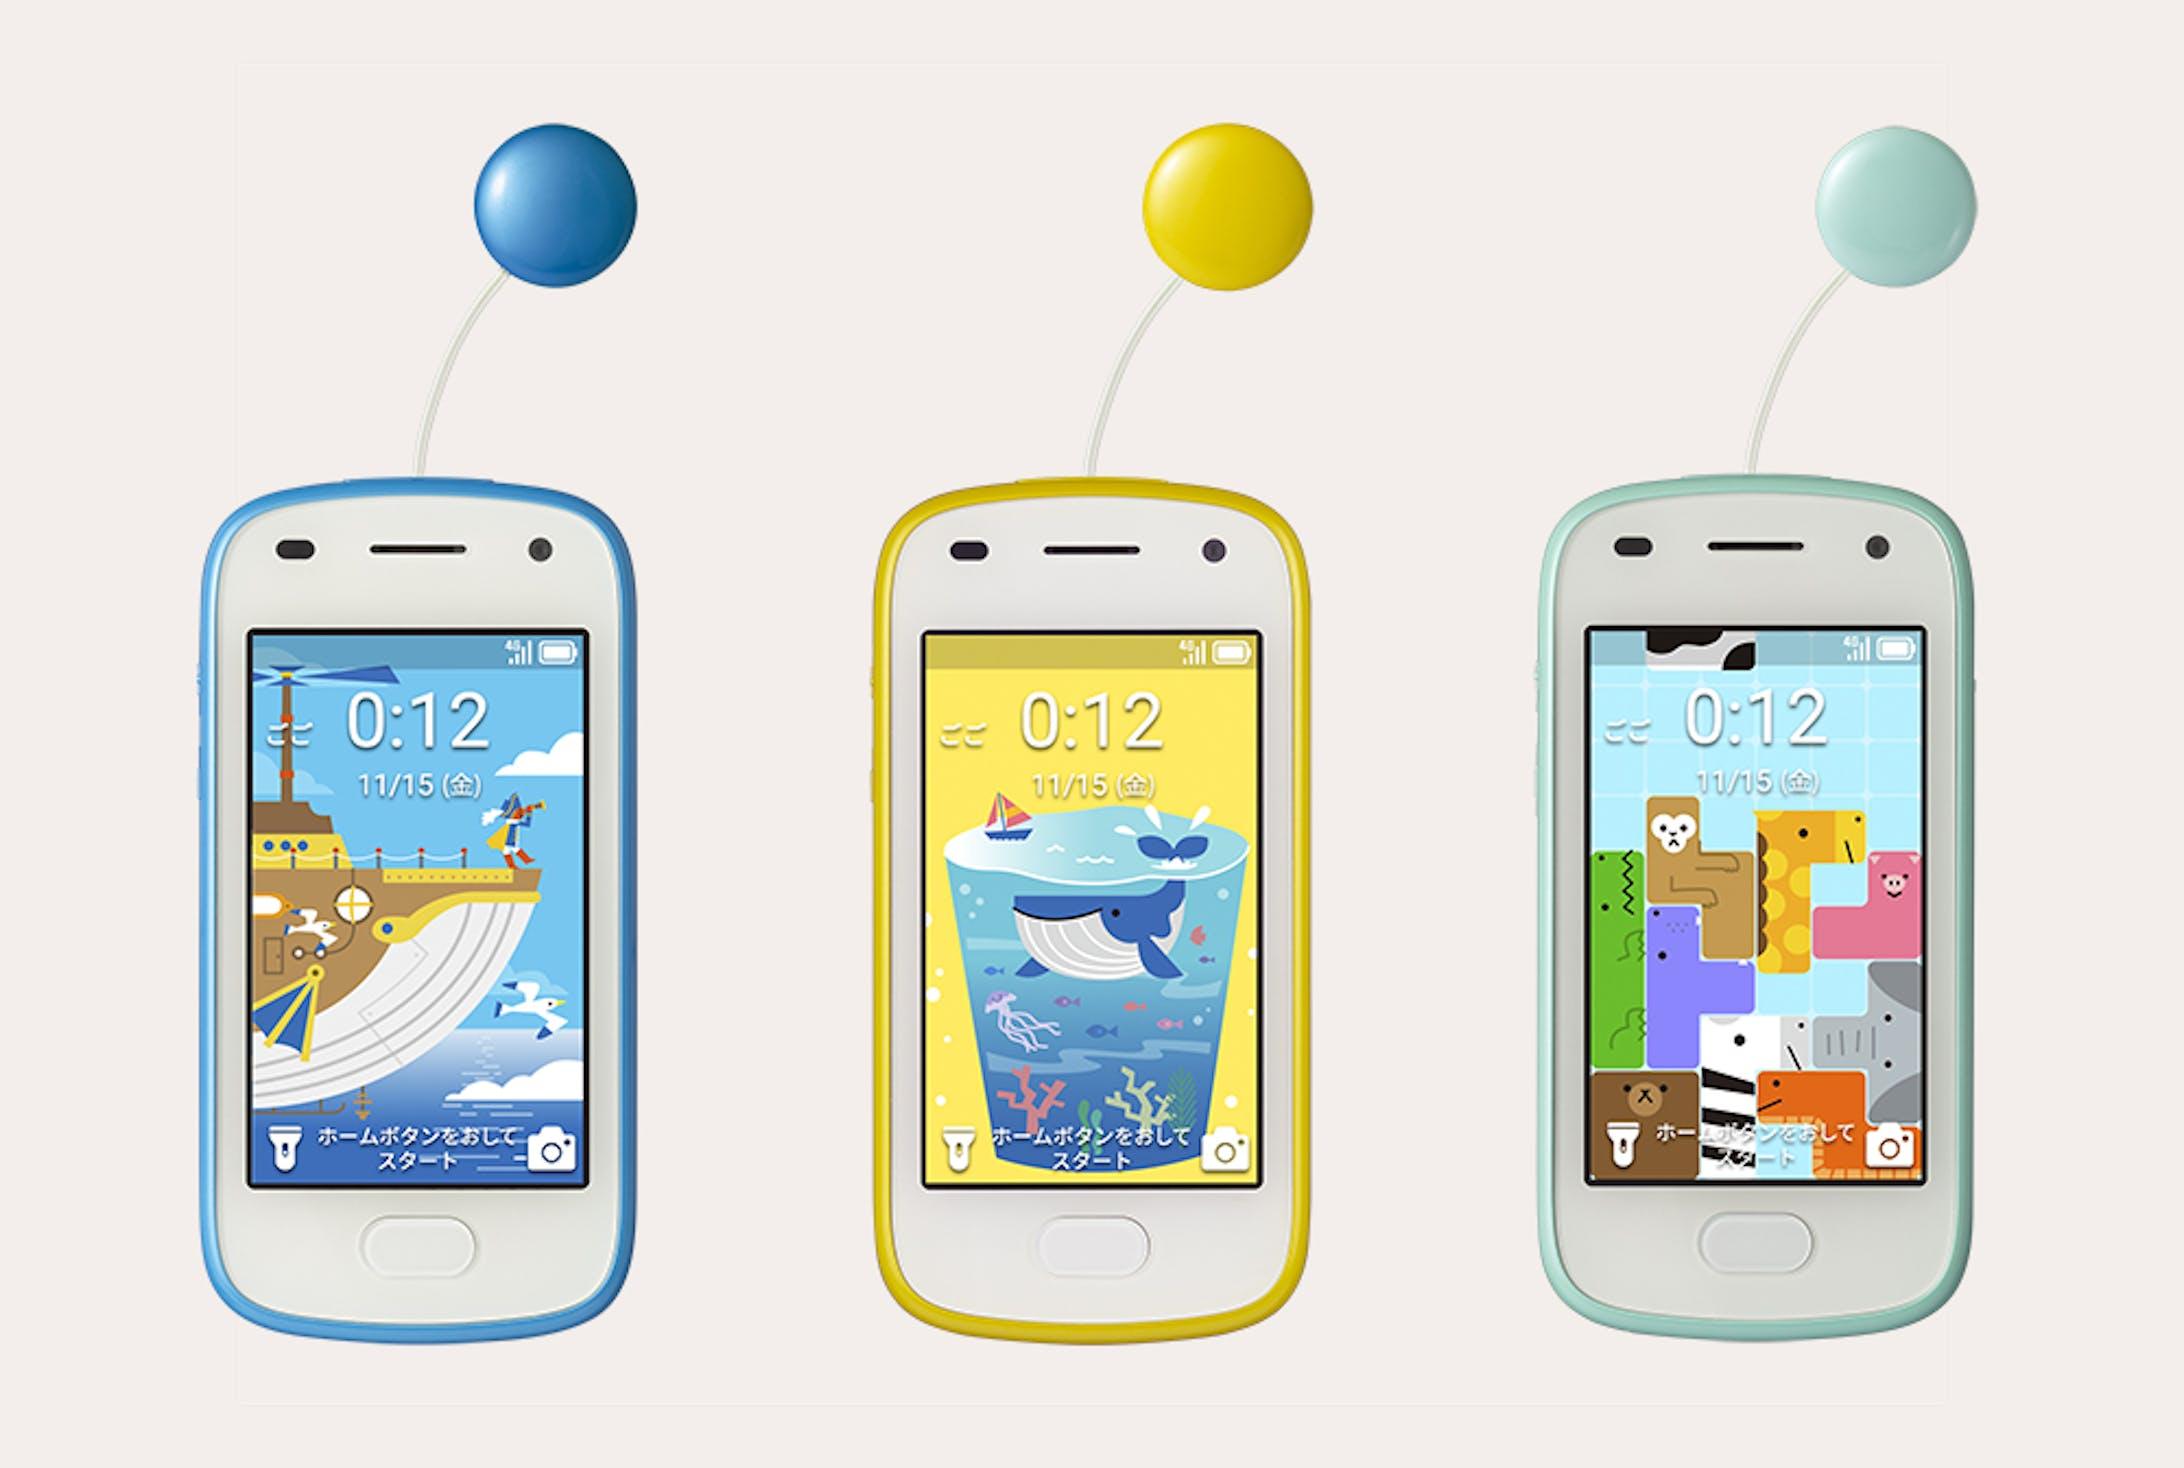 SoftBank キッズフォン2-1